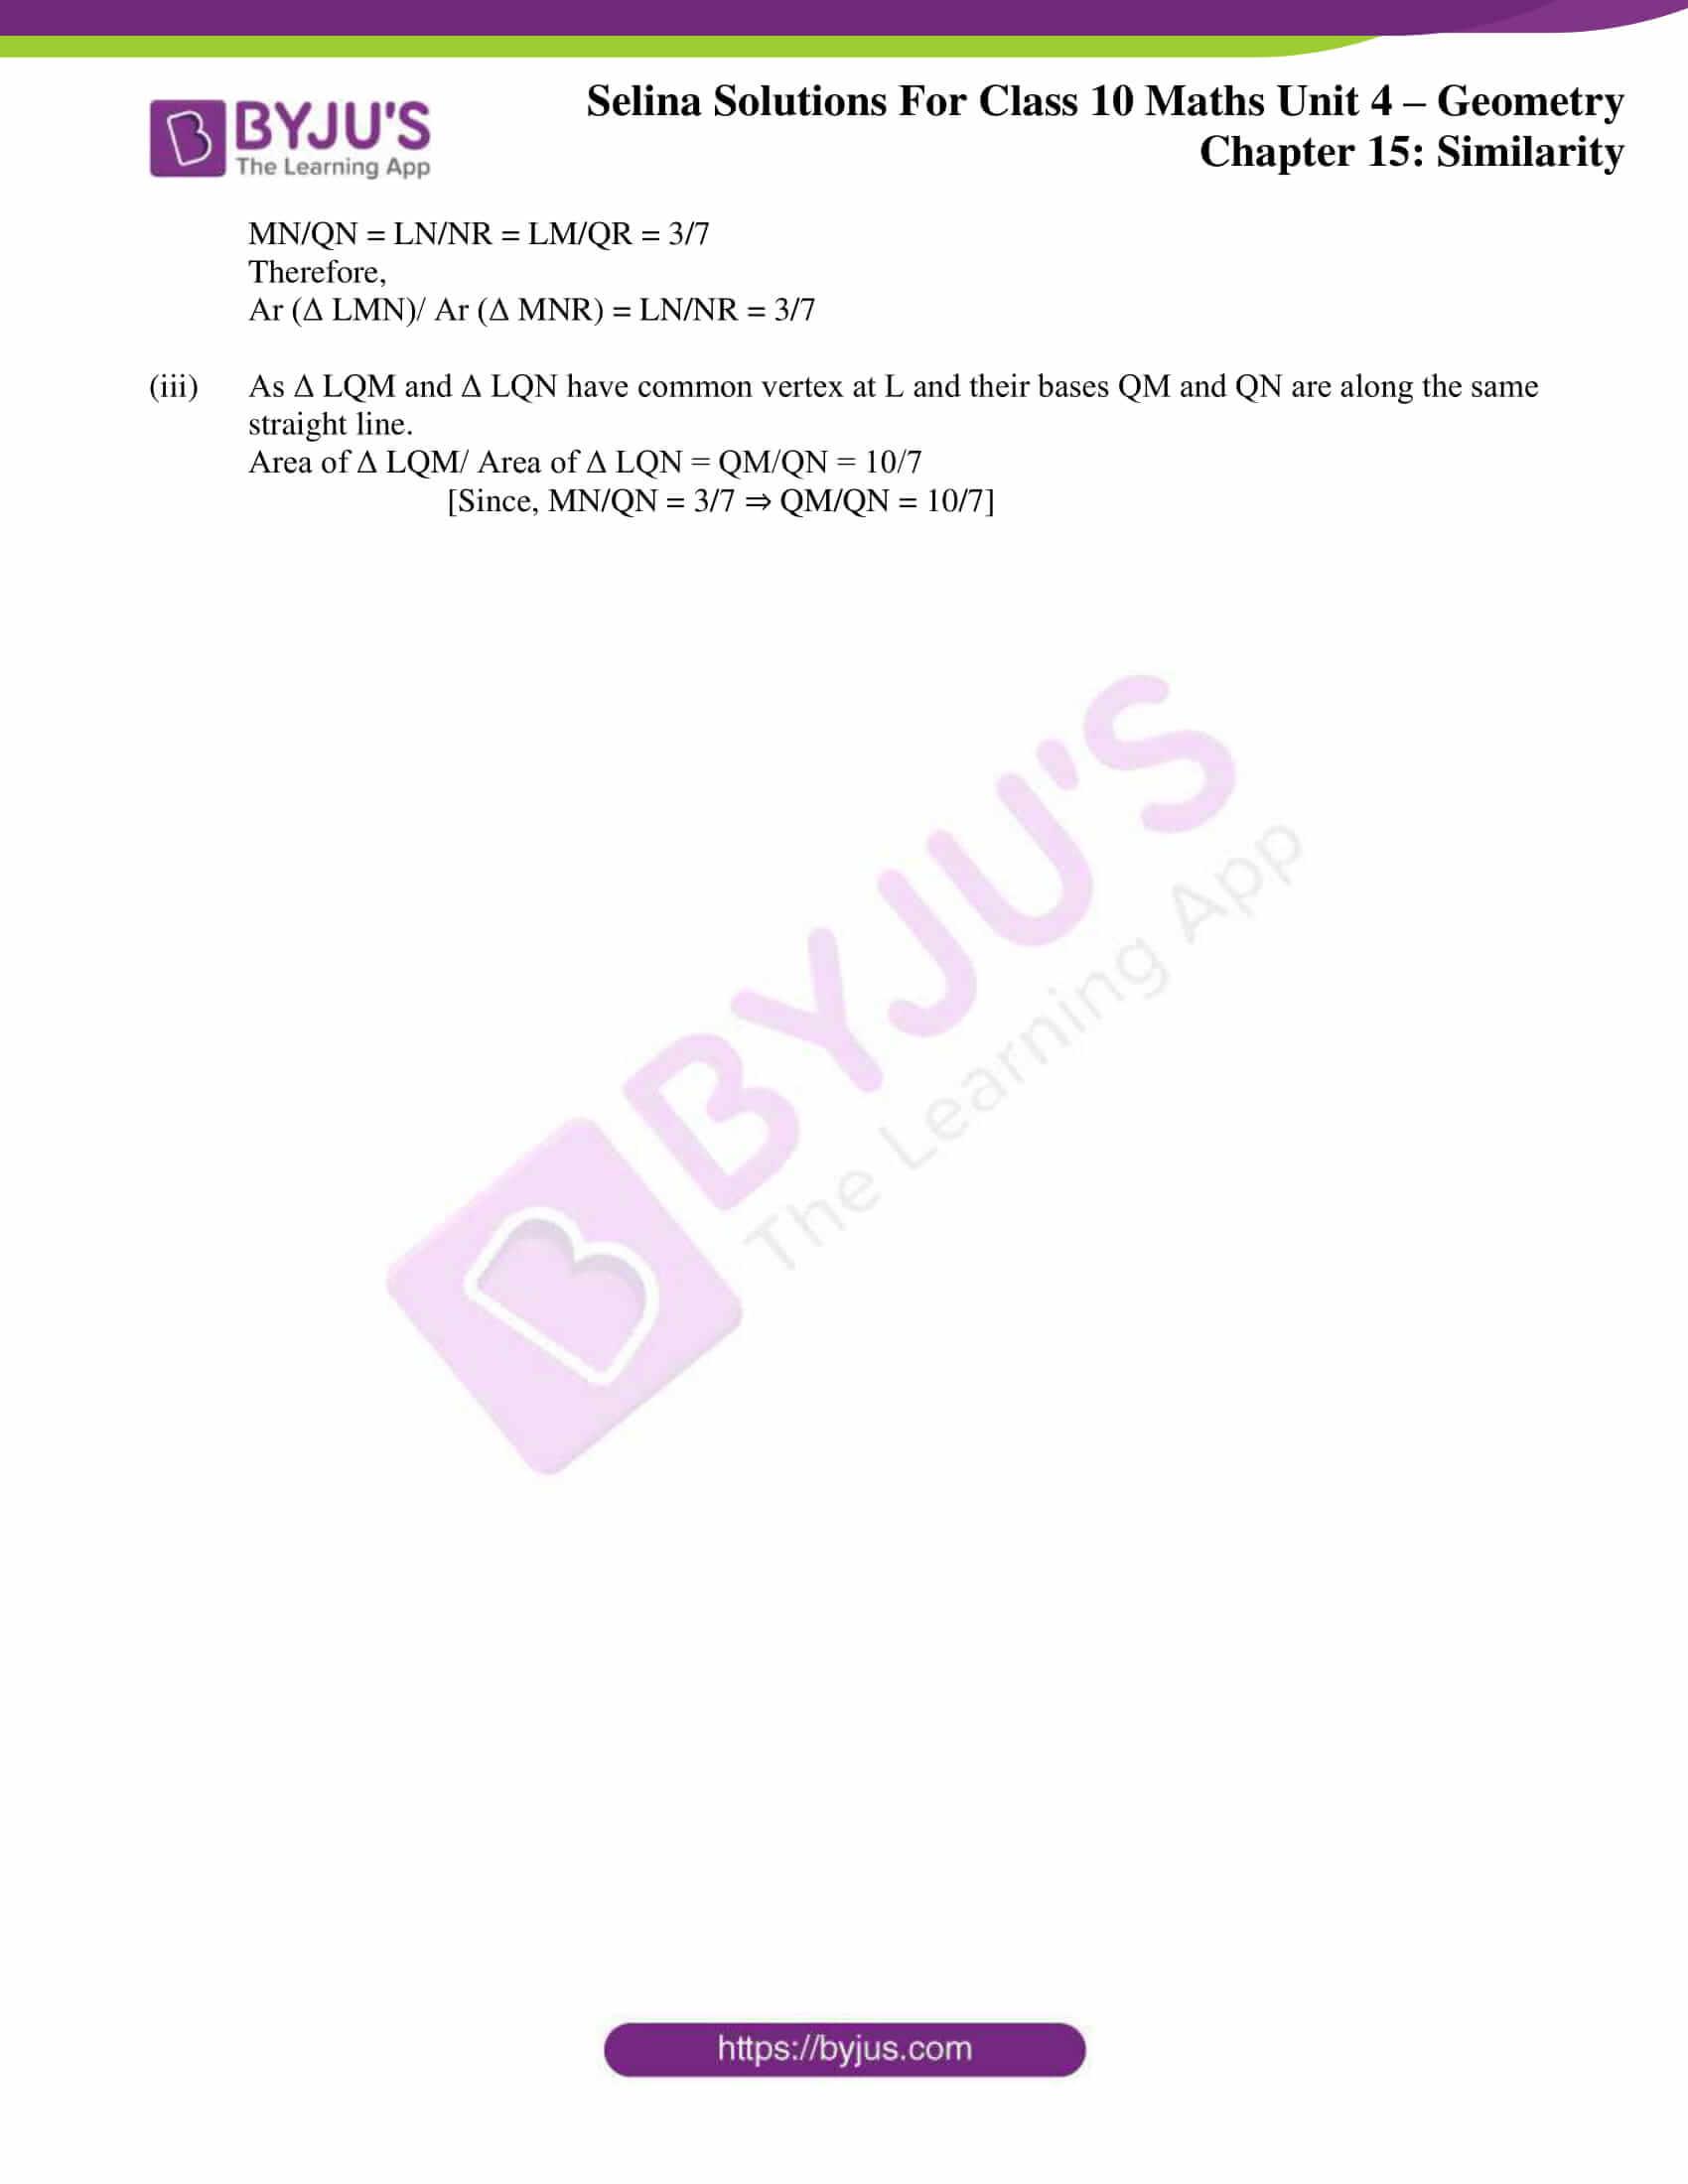 selina-sol-maths-class-10-ch-15-ex-c-4